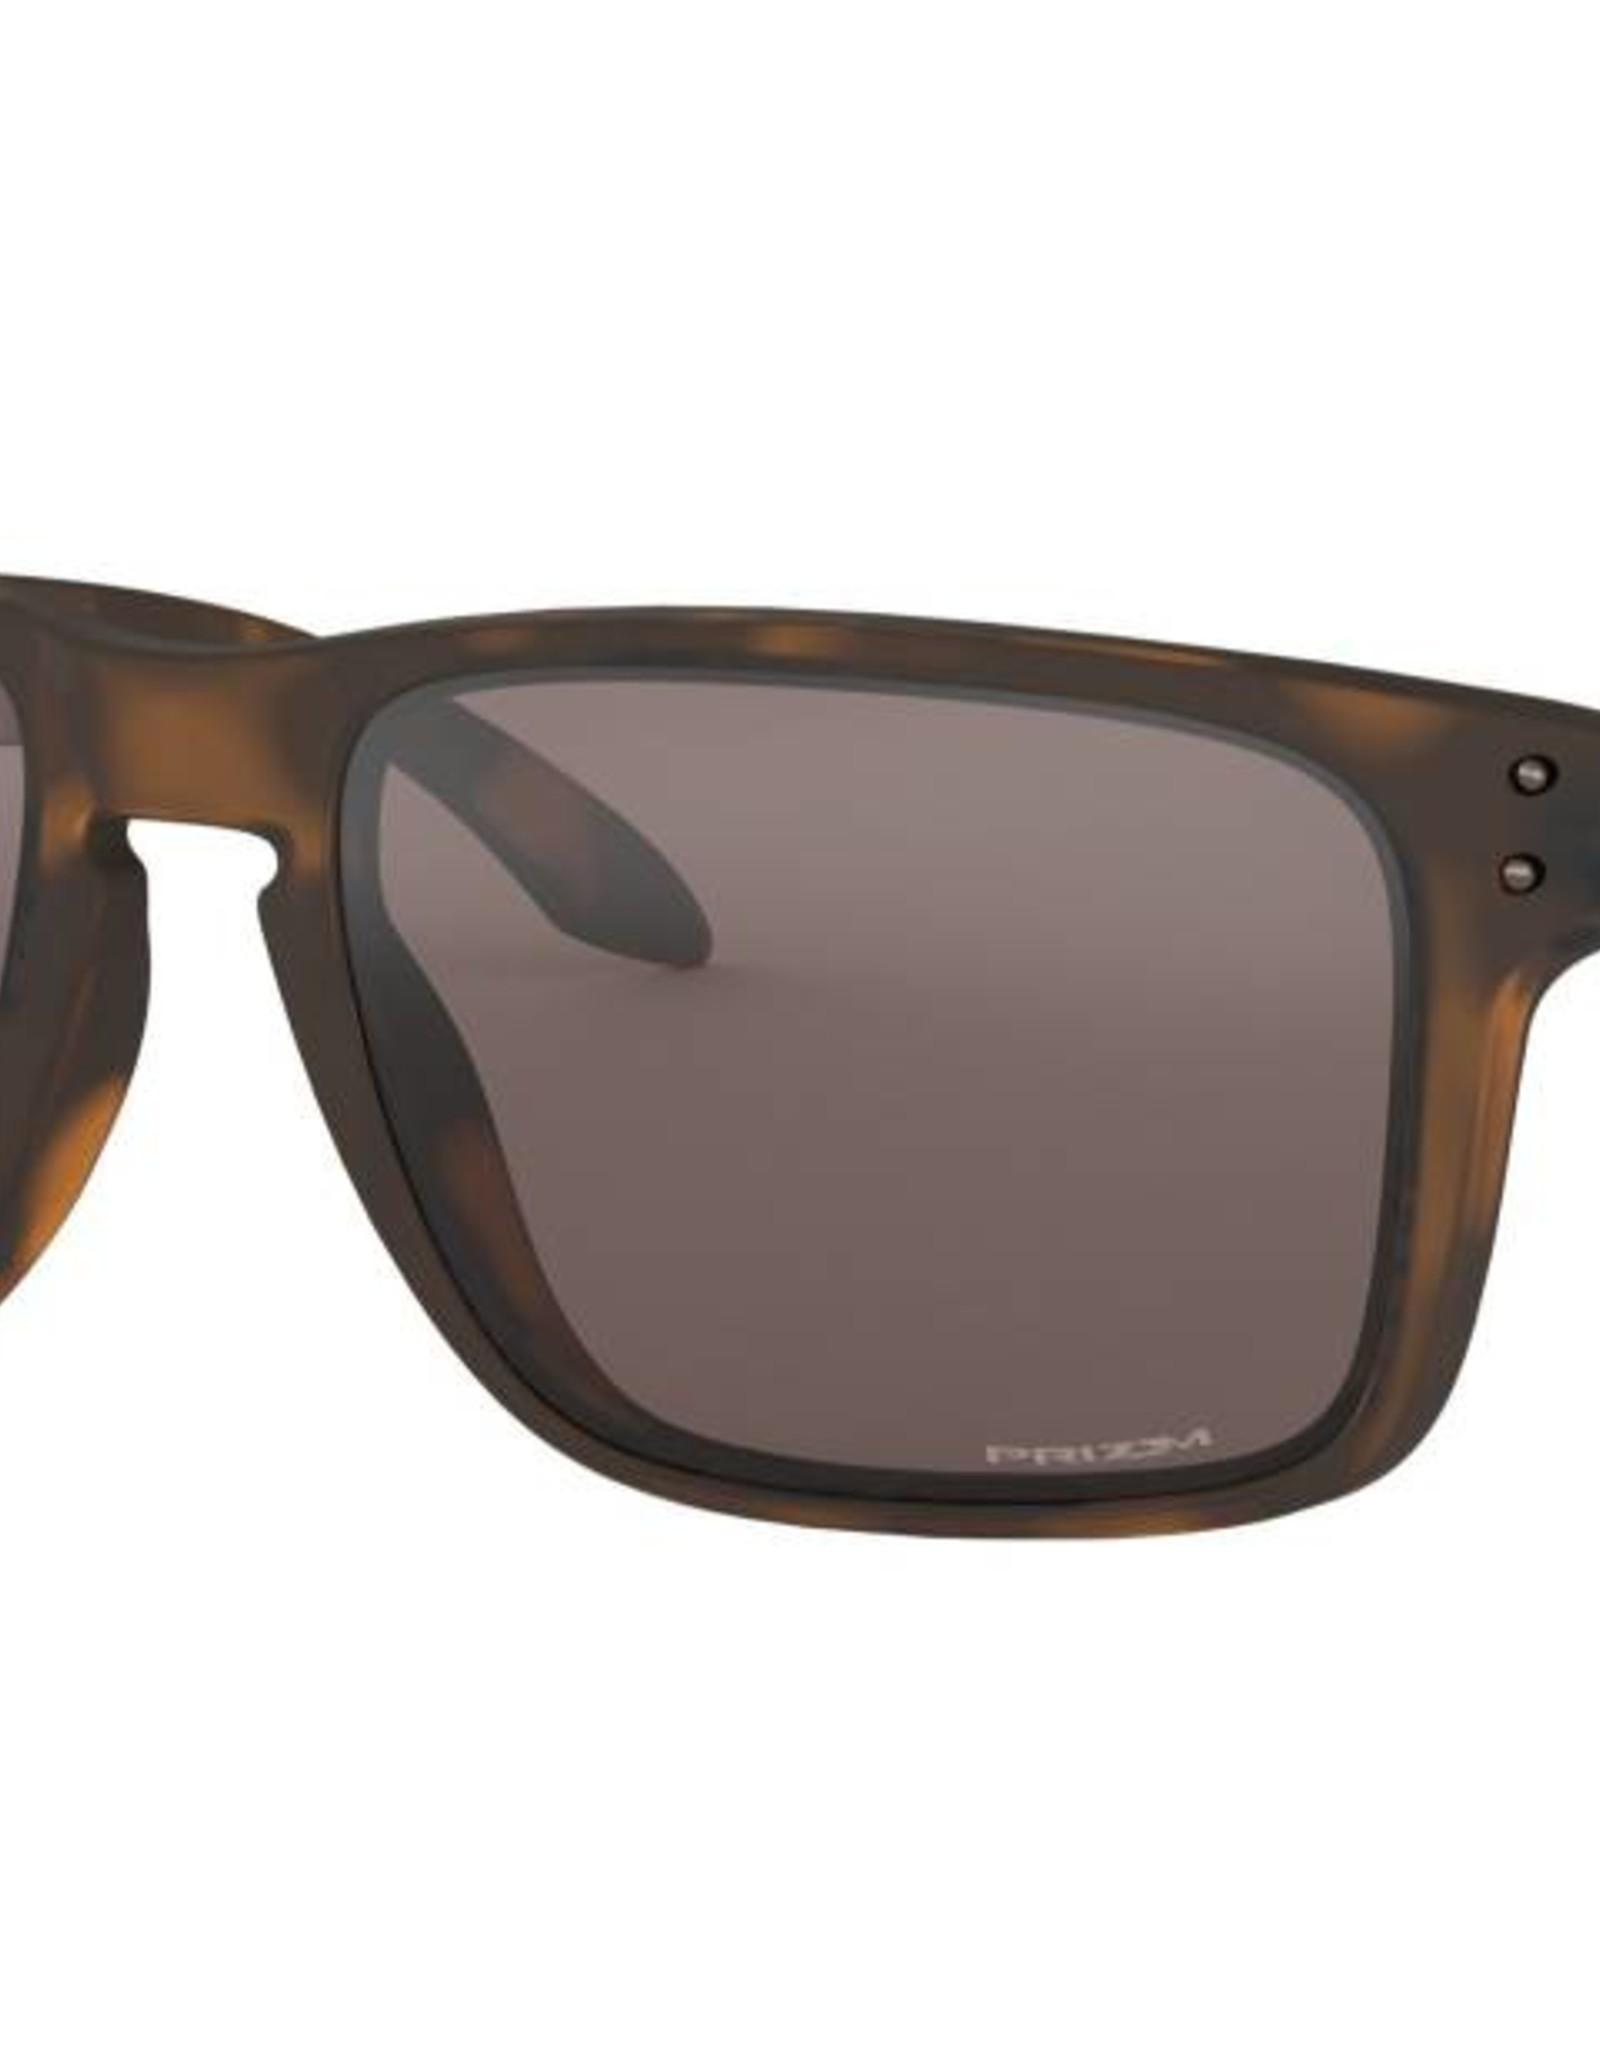 Oakley Oakley - HOLBROOK XL - Matte Brown Tort w/ PRIZM Black Iridium